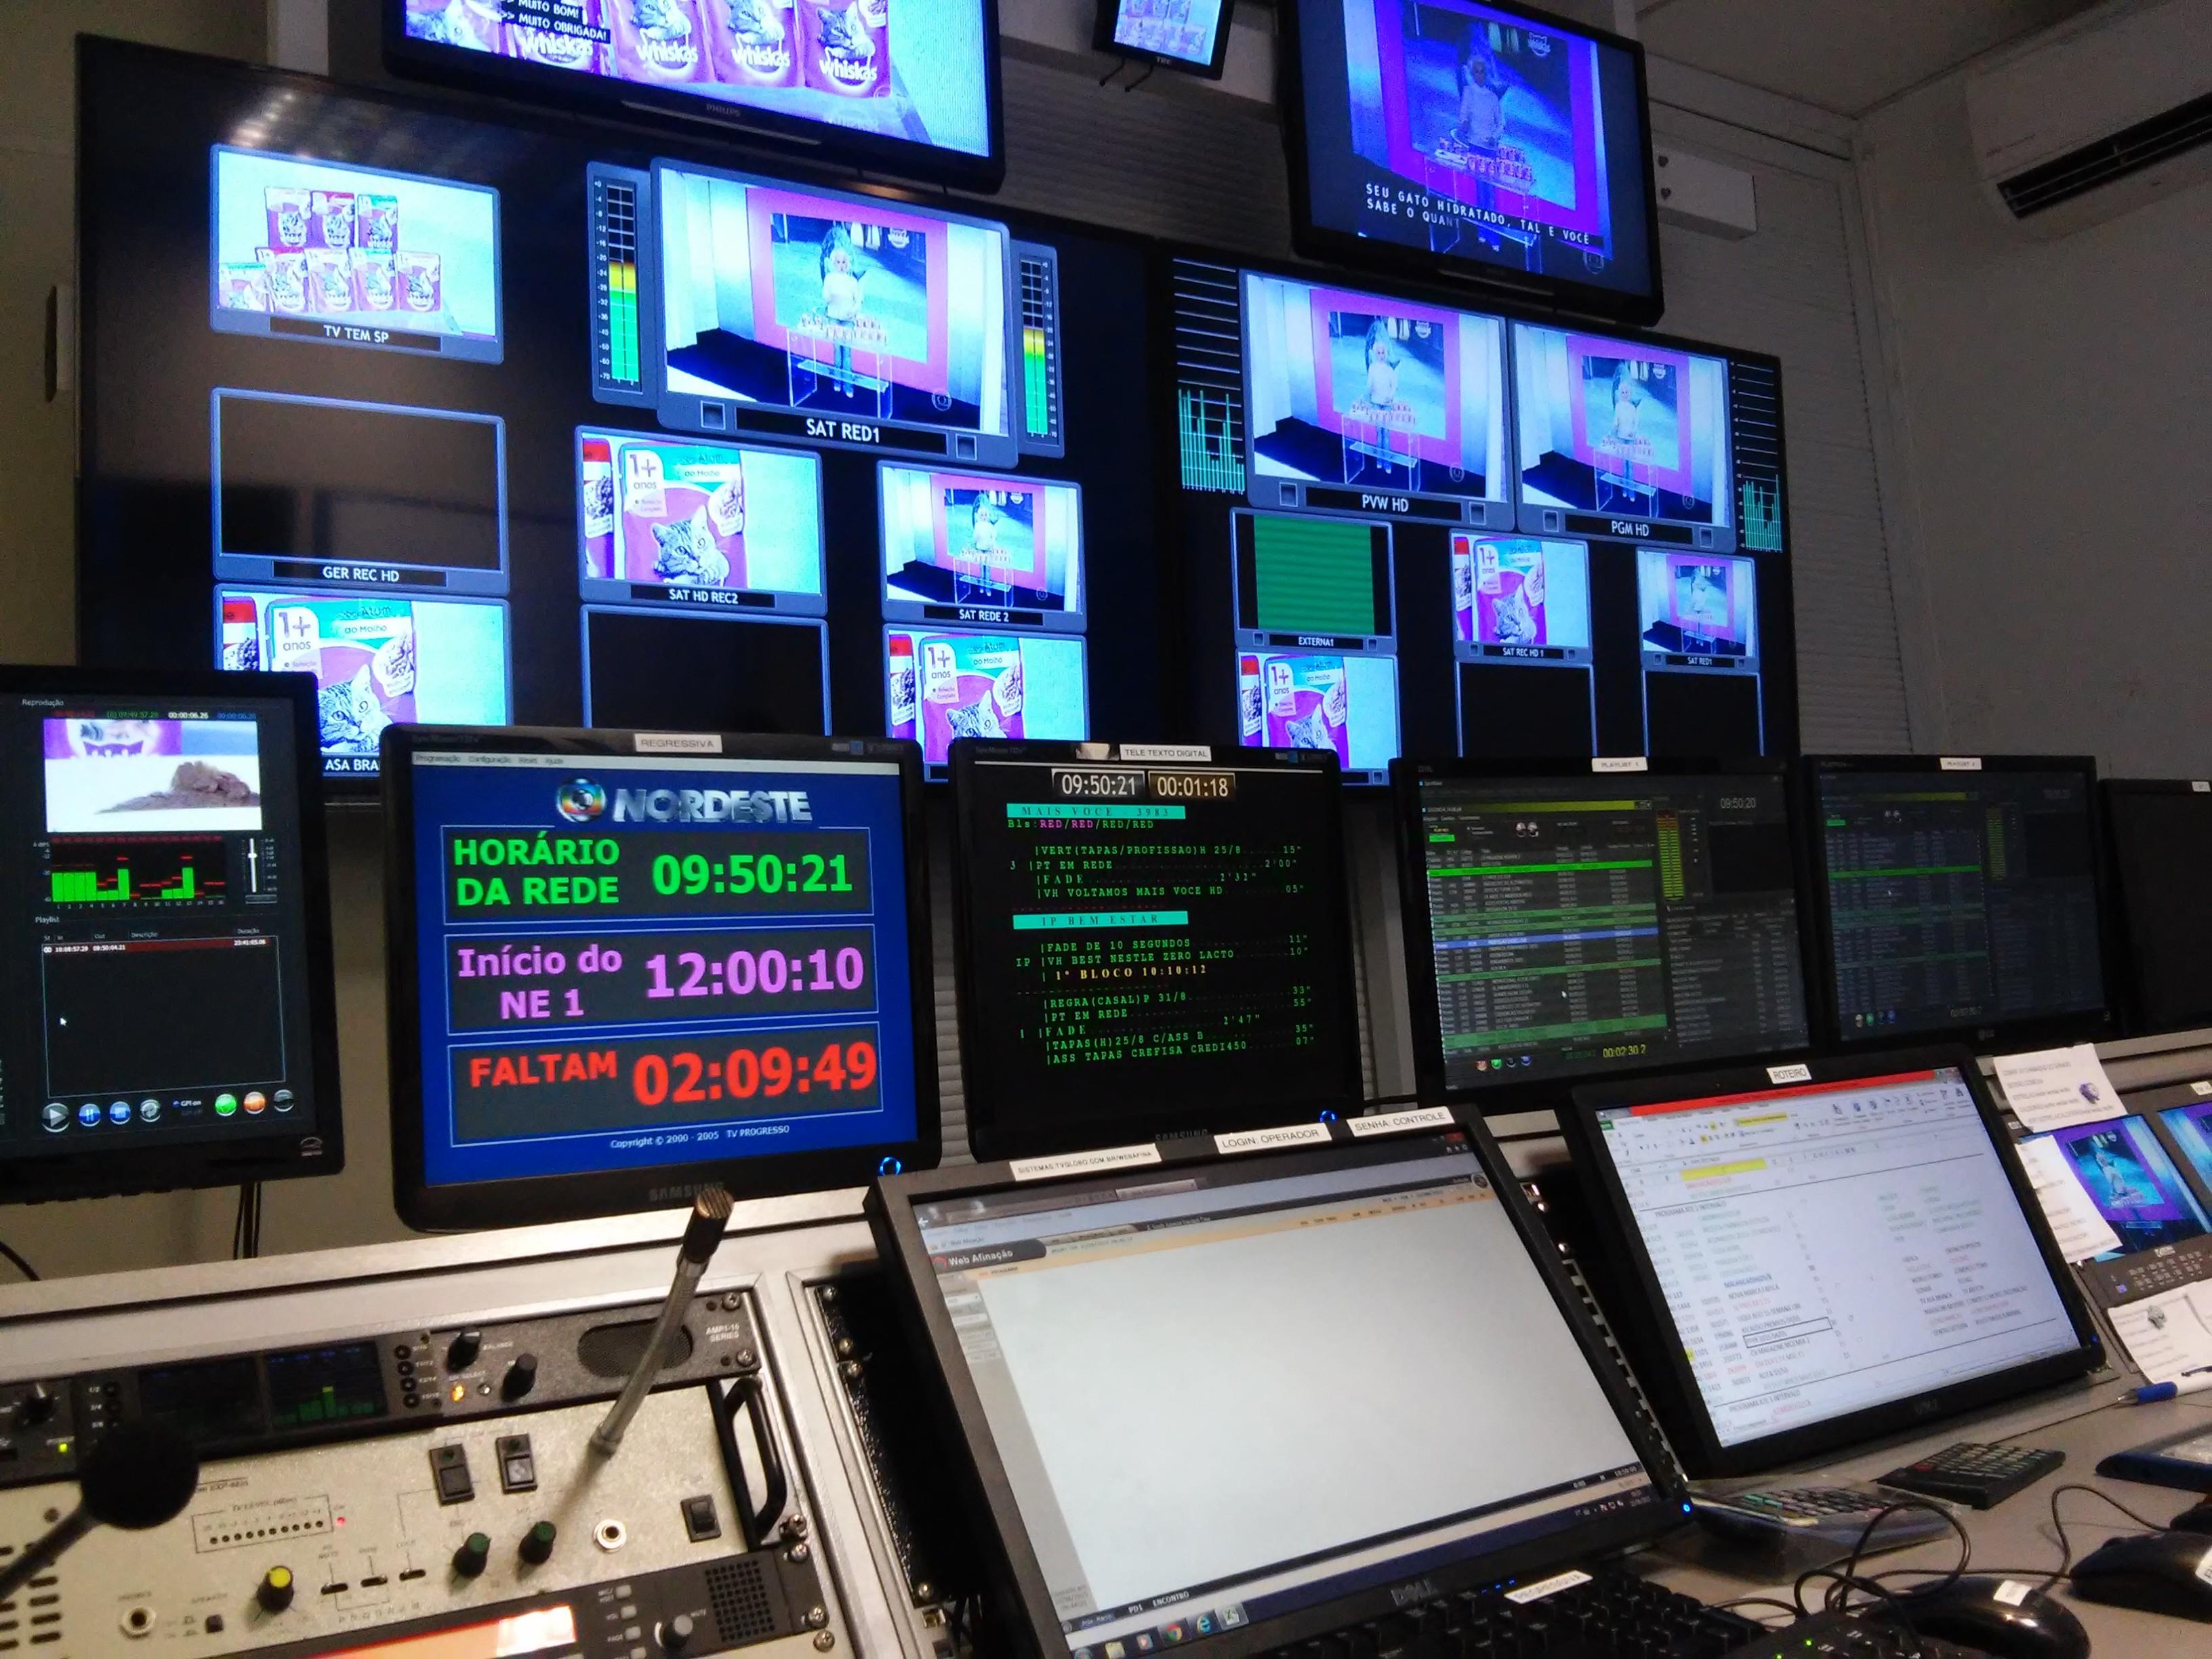 Sala do Controle Mestre da TV Asa Branca (Foto: André Hilton / TV Asa Branca)